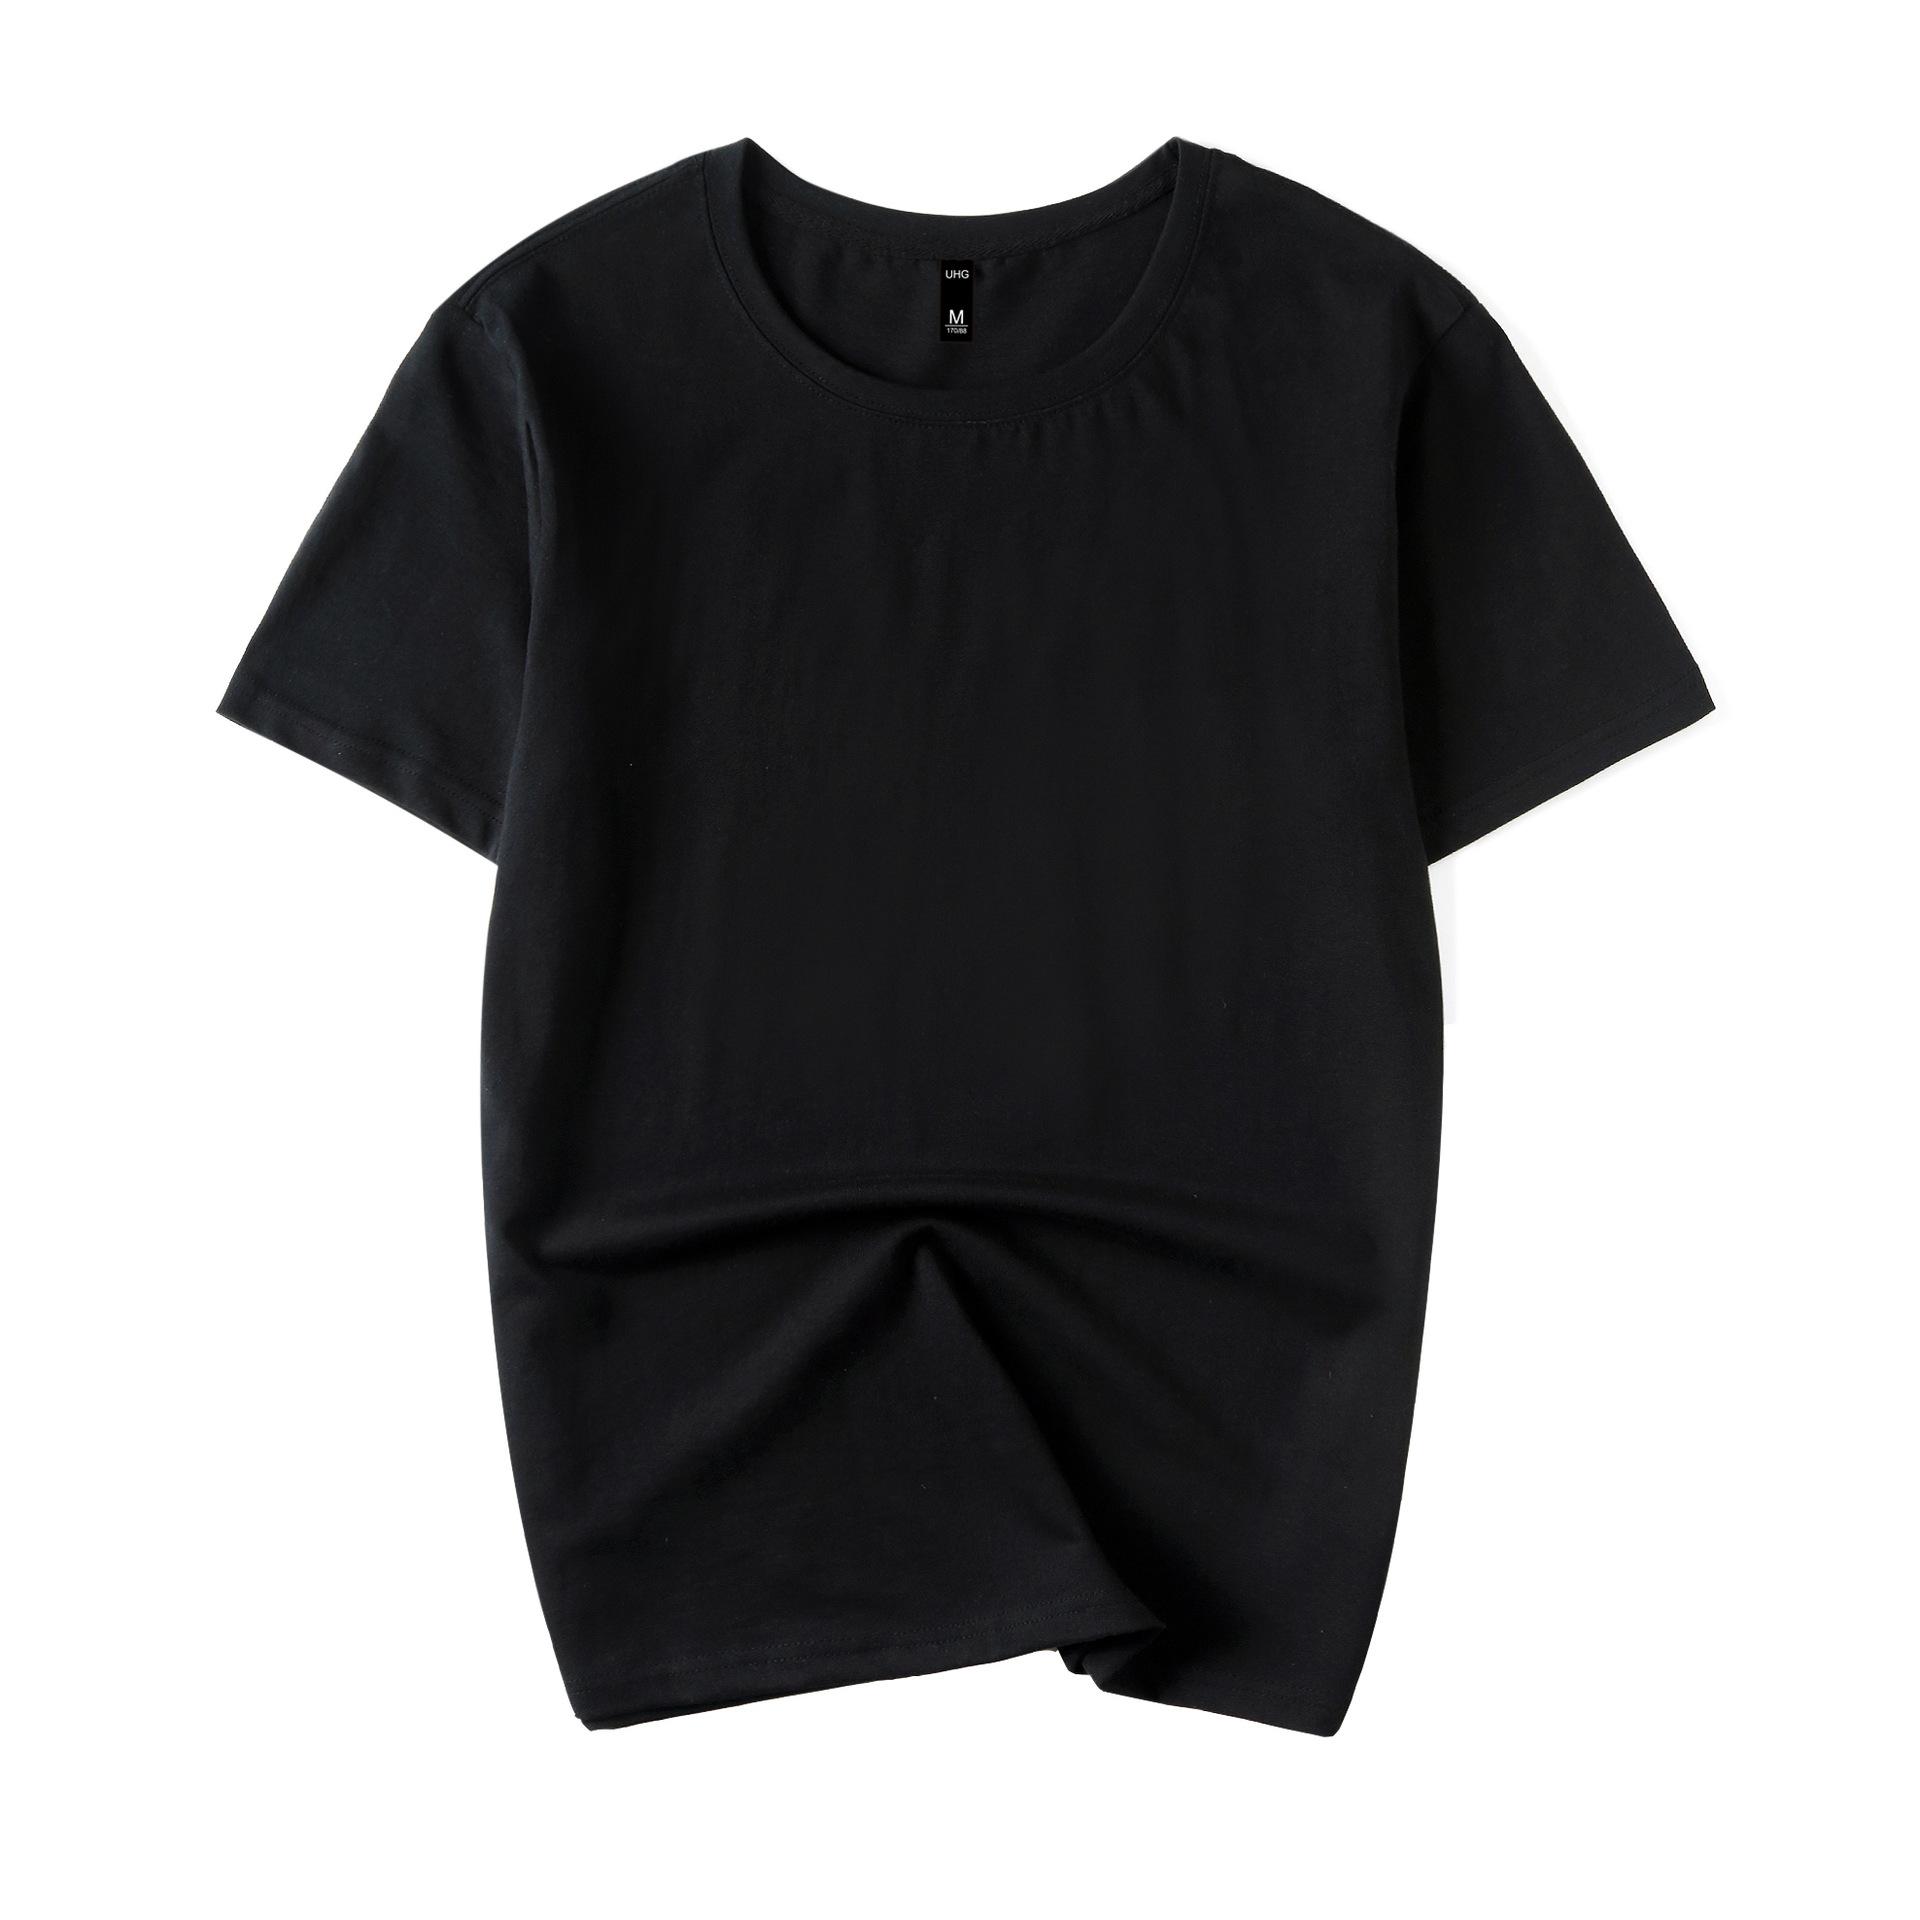 Black Men's short sleeve T-shirt